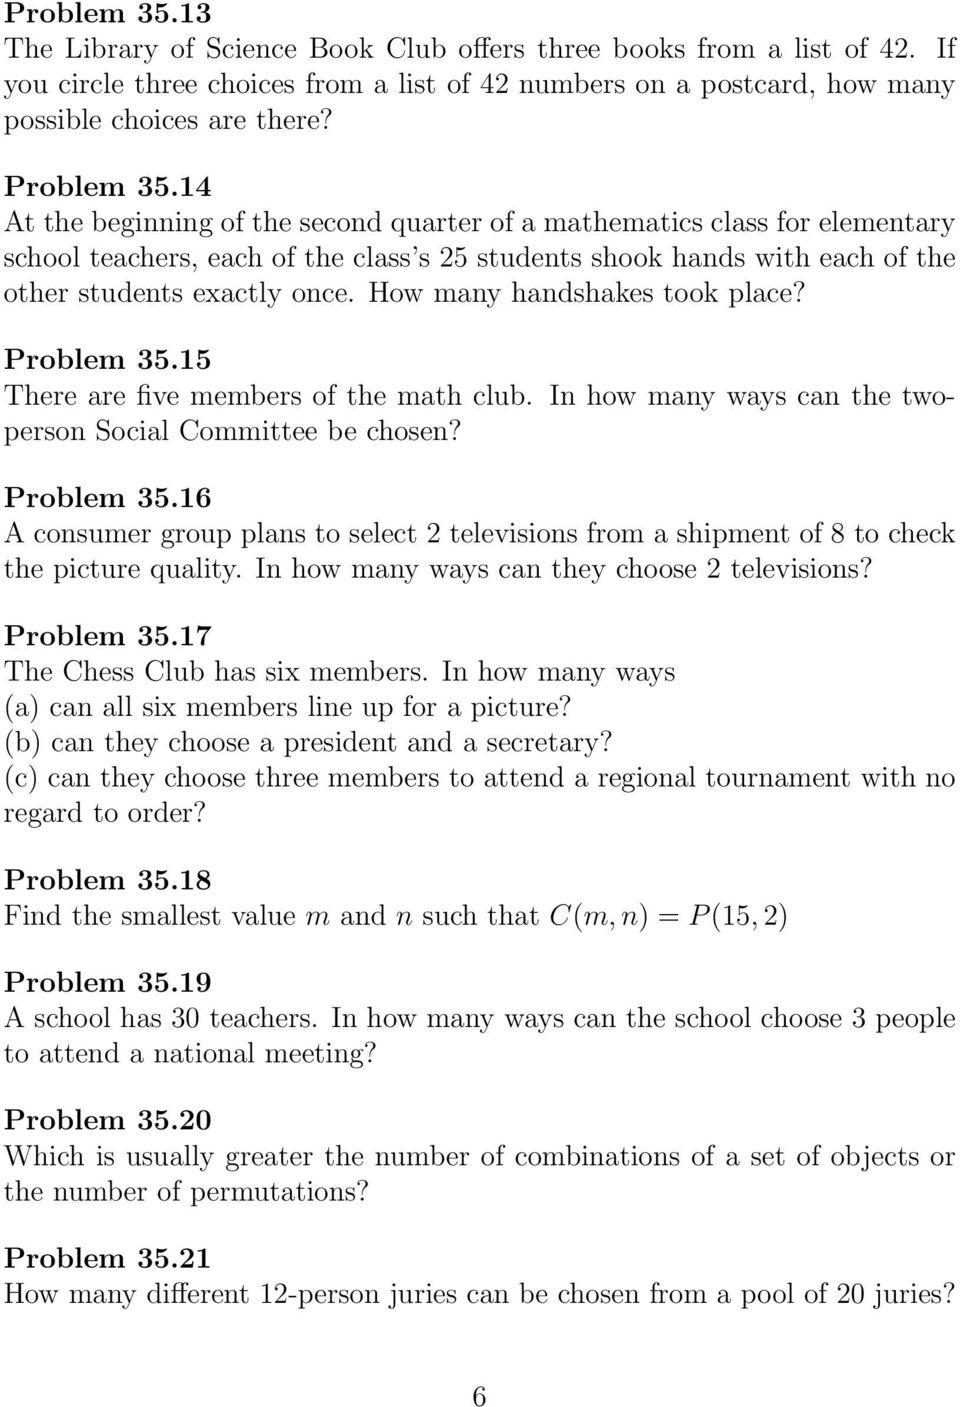 hight resolution of 35 Permutations